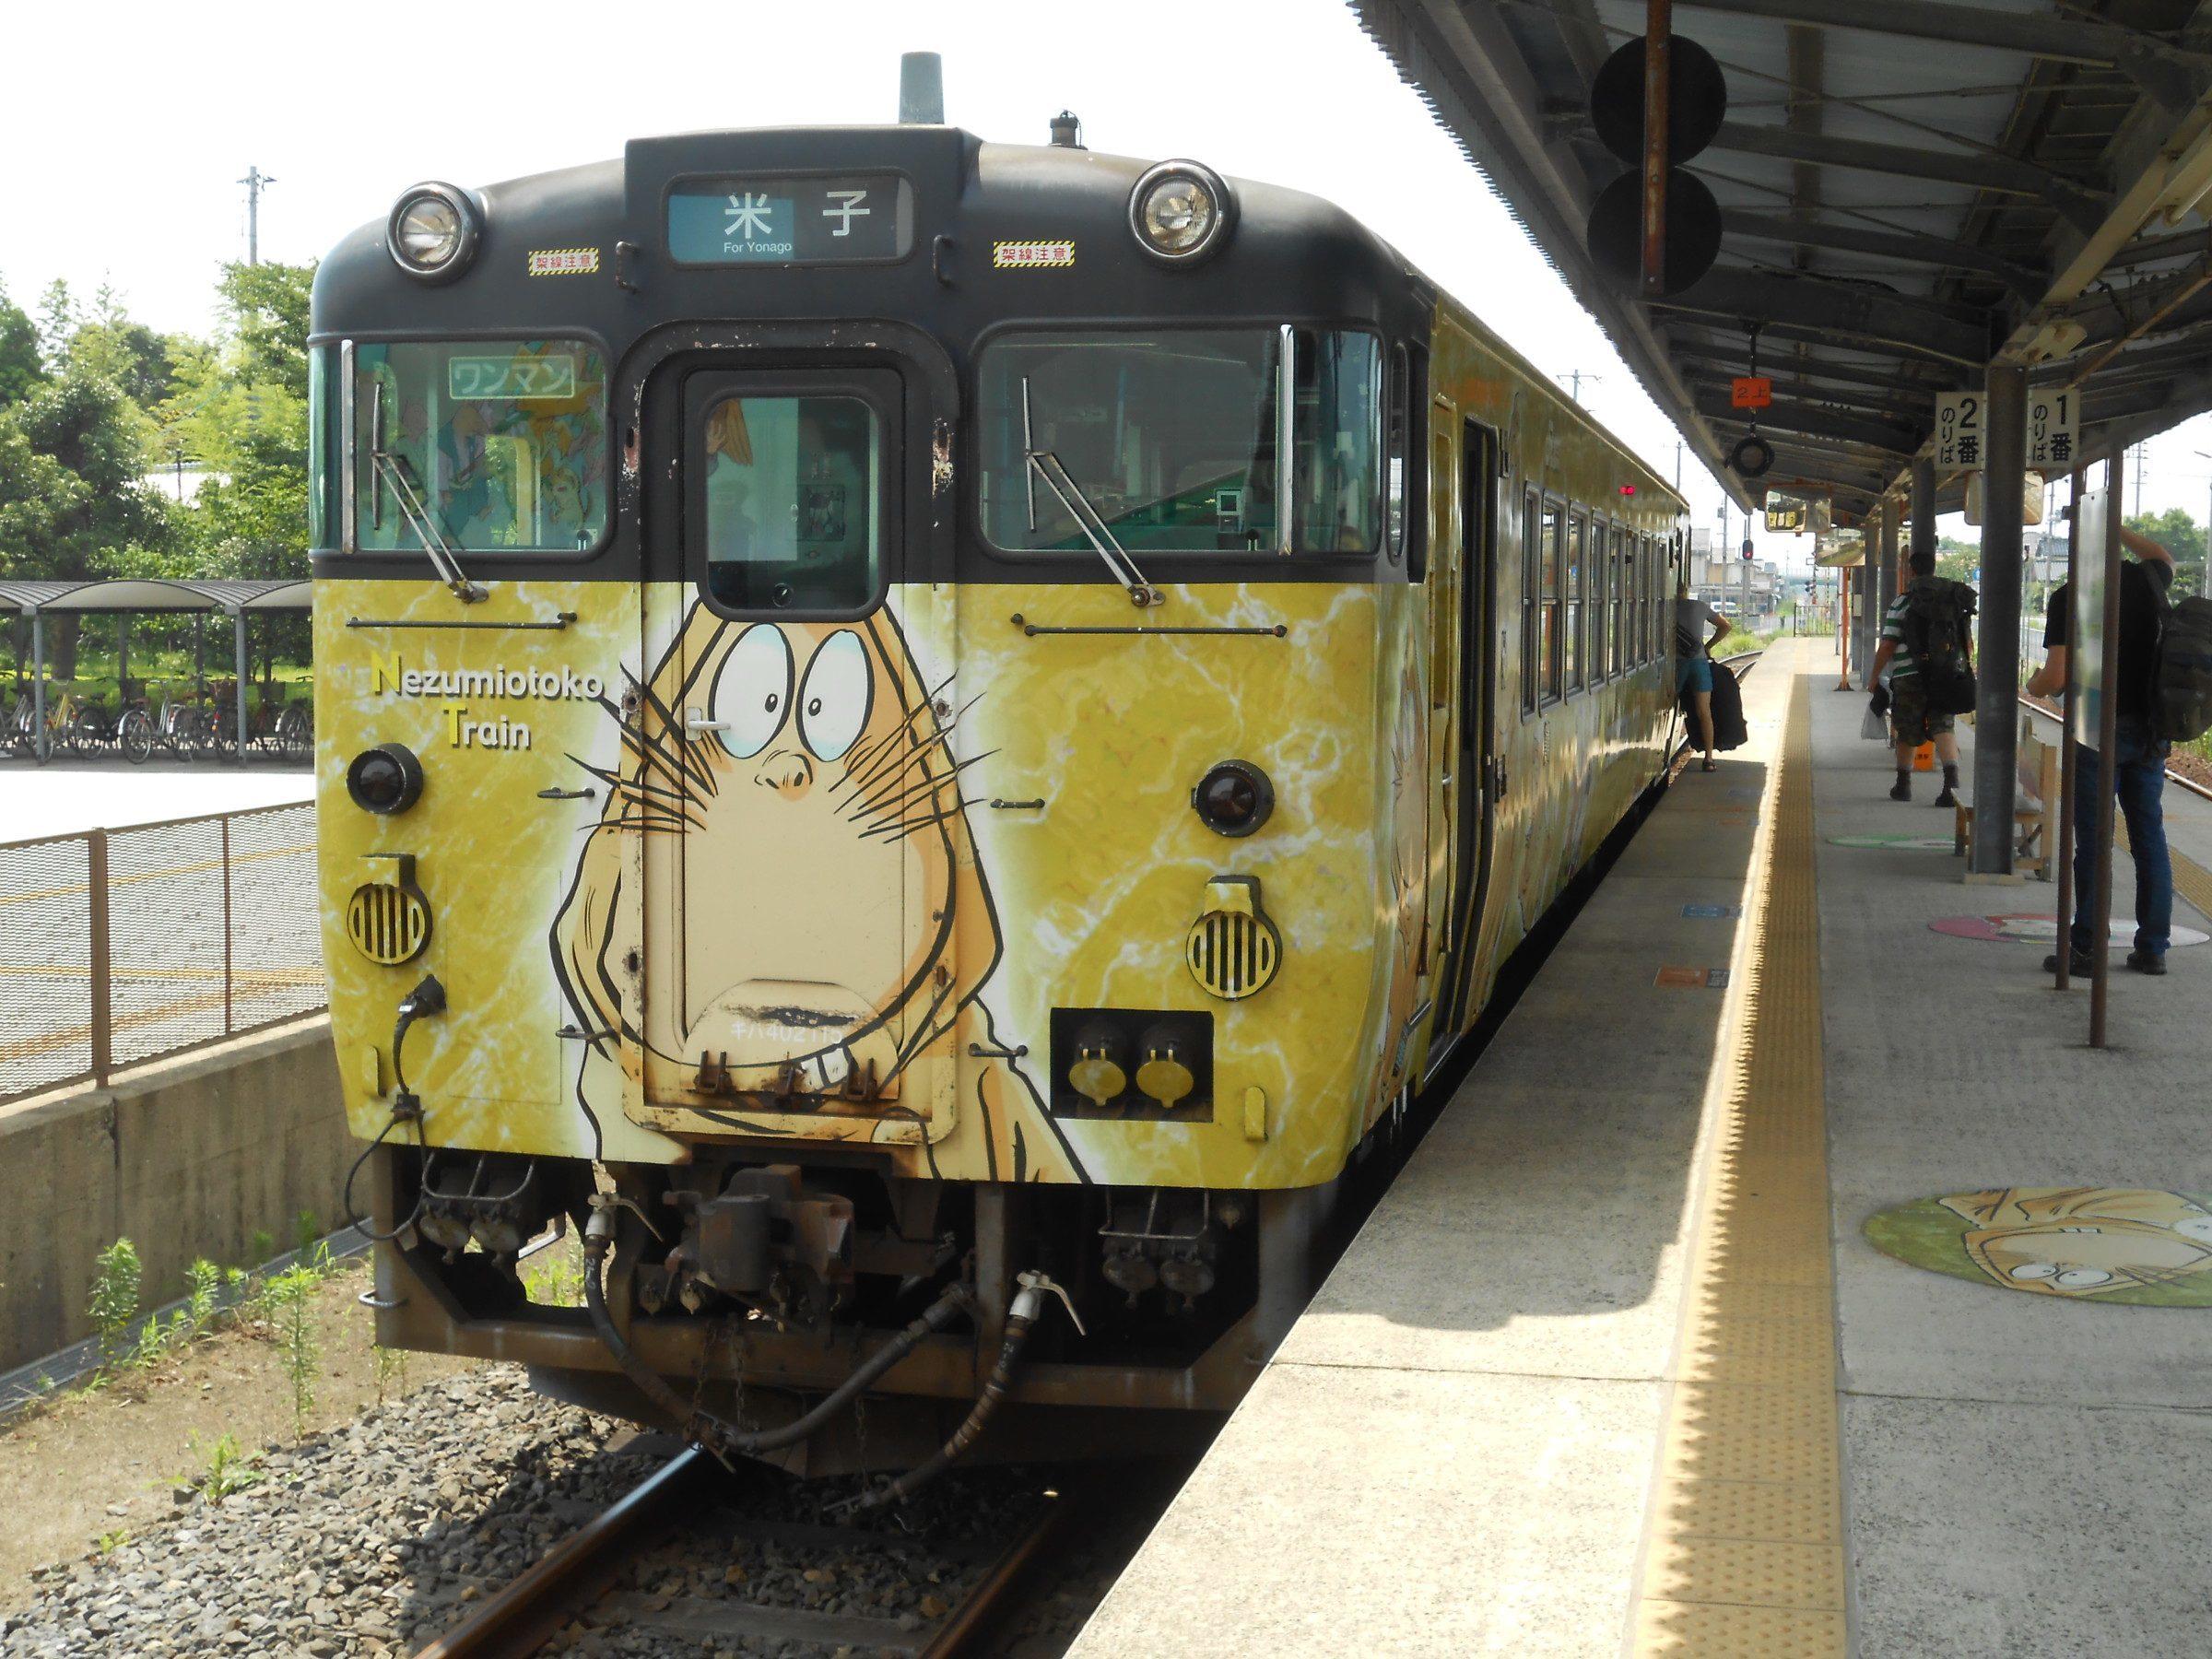 Local trains